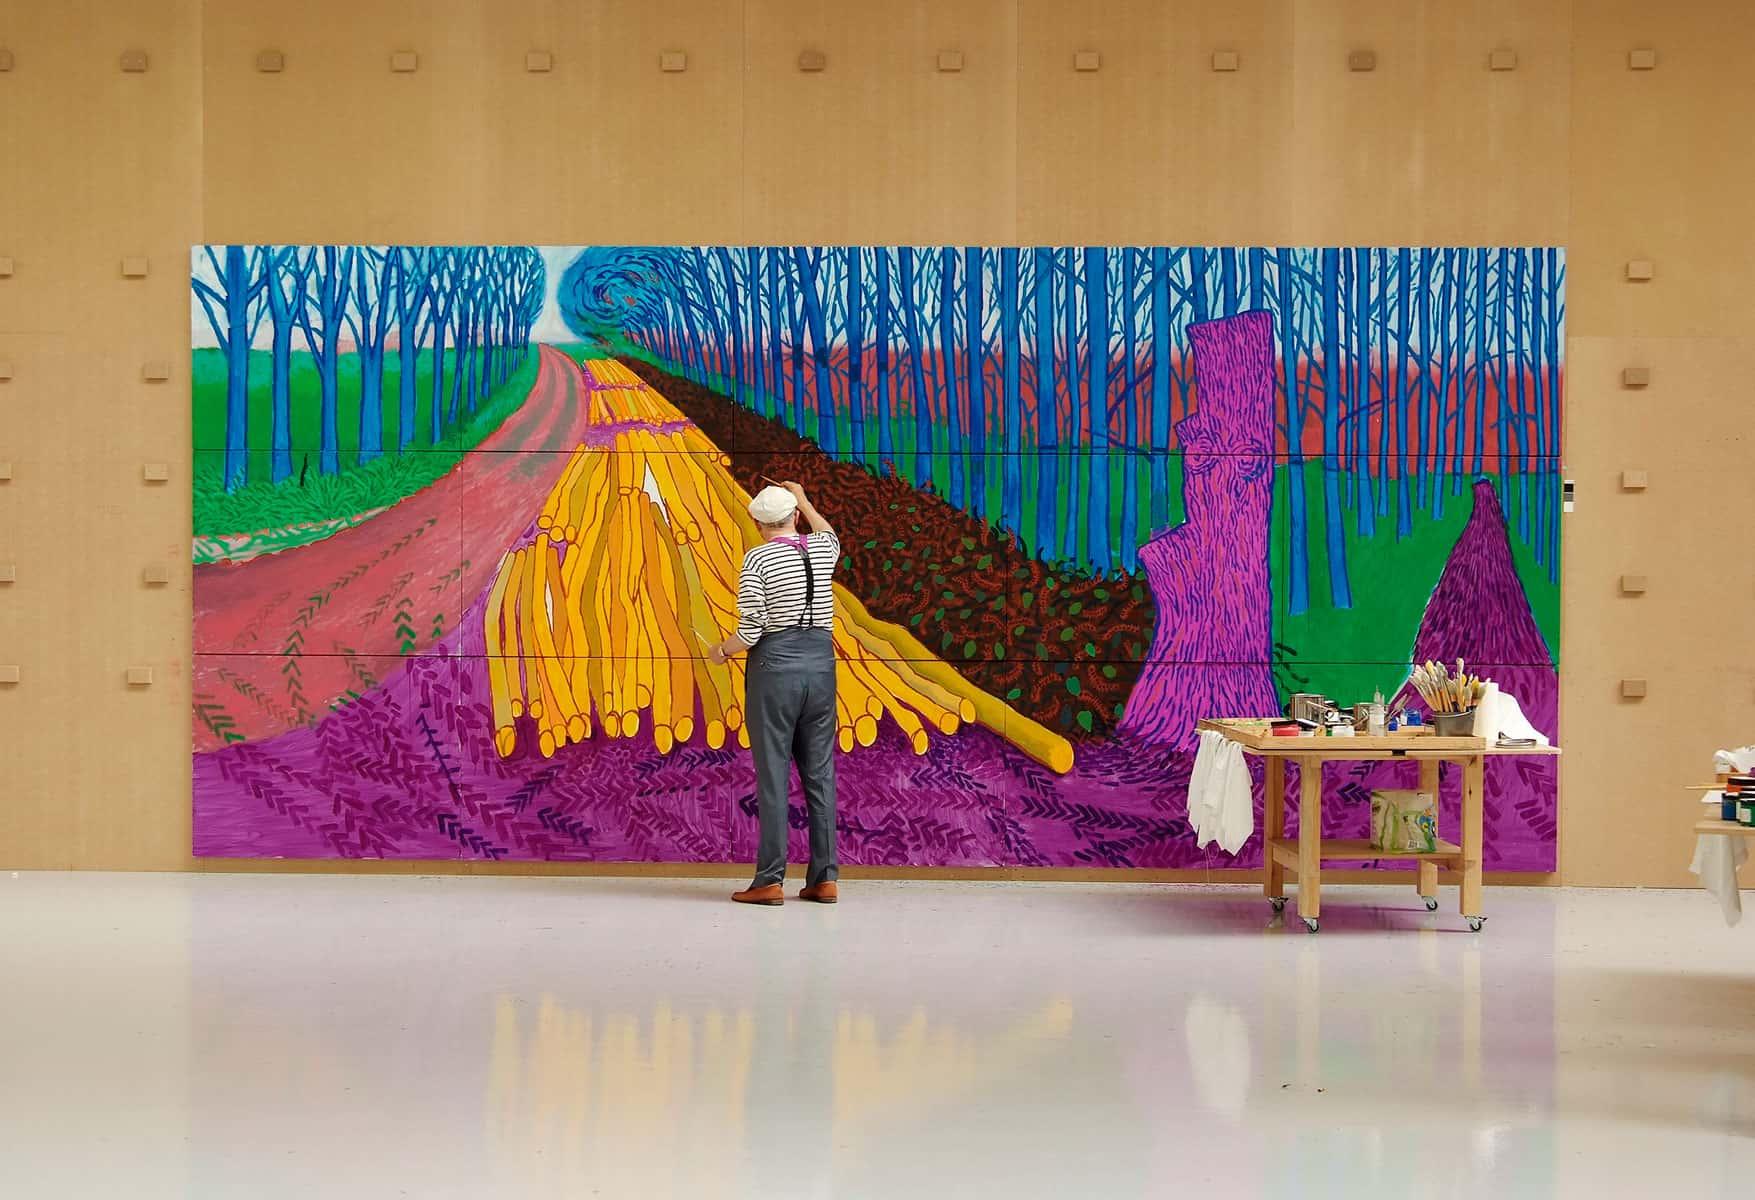 TPS Exhibition on Screen David Hockney 1